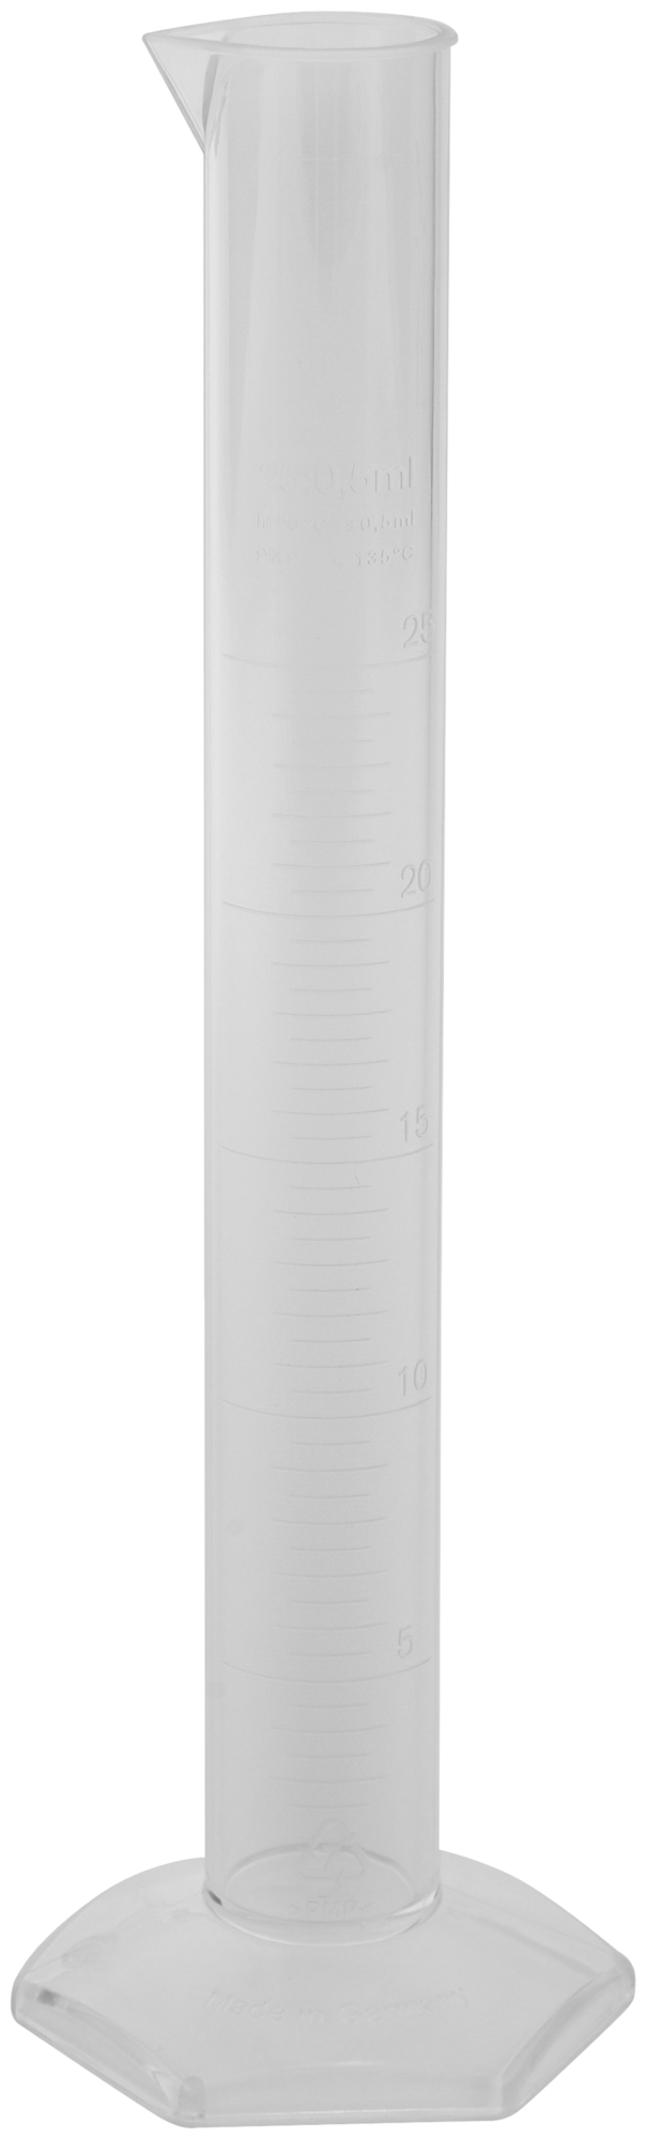 Cylinders, Item Number 594213